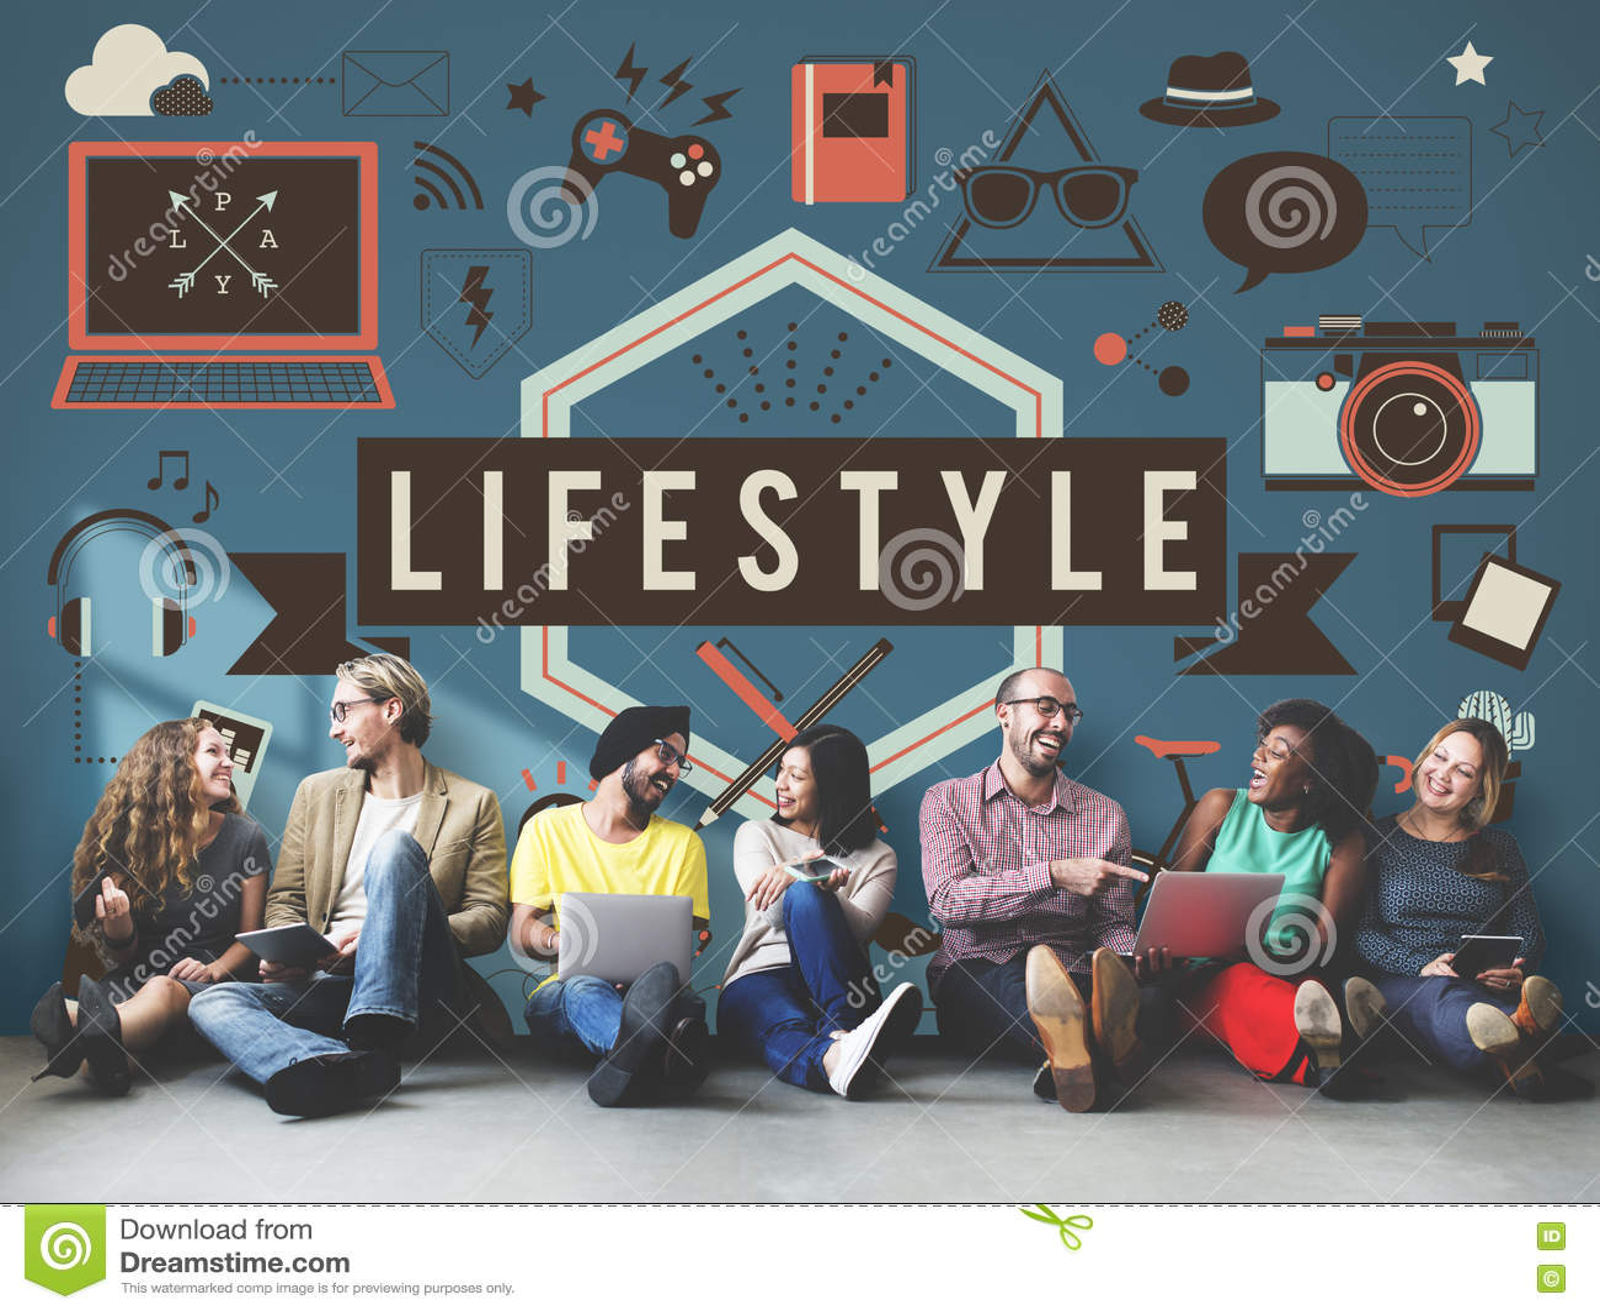 Lifestyle Hobbies Media Technology Concept Stock ...  Lifestyle Hobbi...